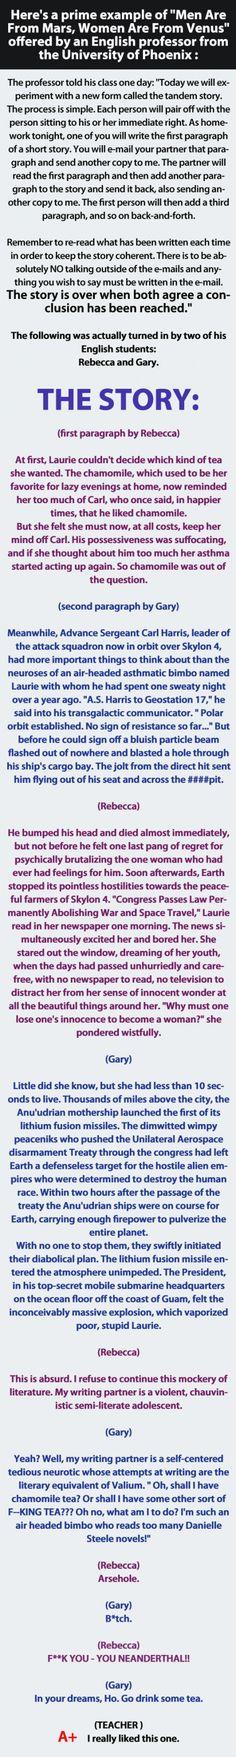 2 literature students email short story homework. Hahahaha! Freaking great